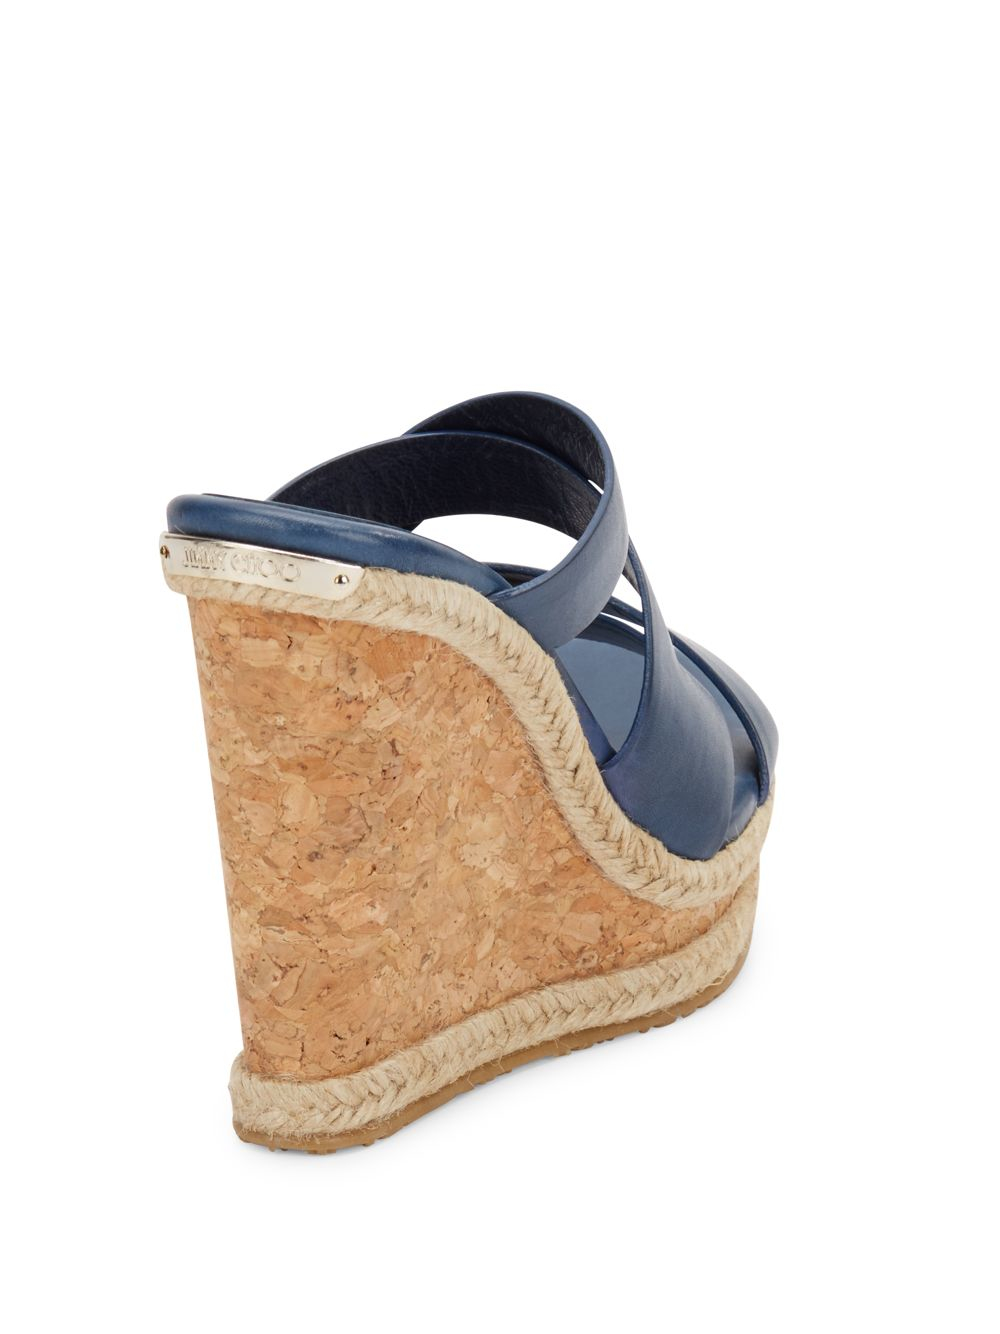 jimmy choo prisma leather cork wedge sandals in blue lyst